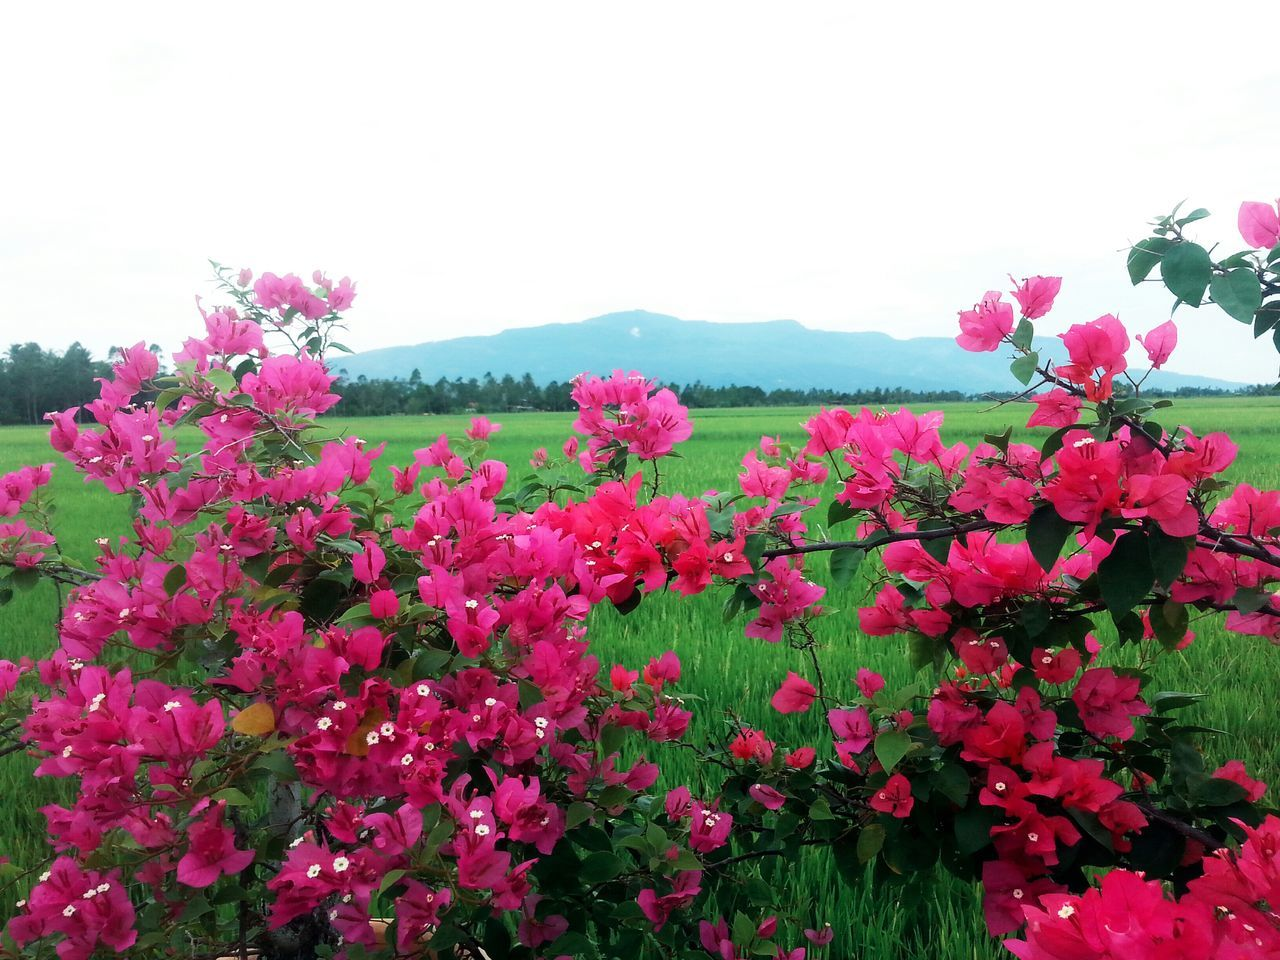 Close-Up Of Pink Flowers Against Landscape